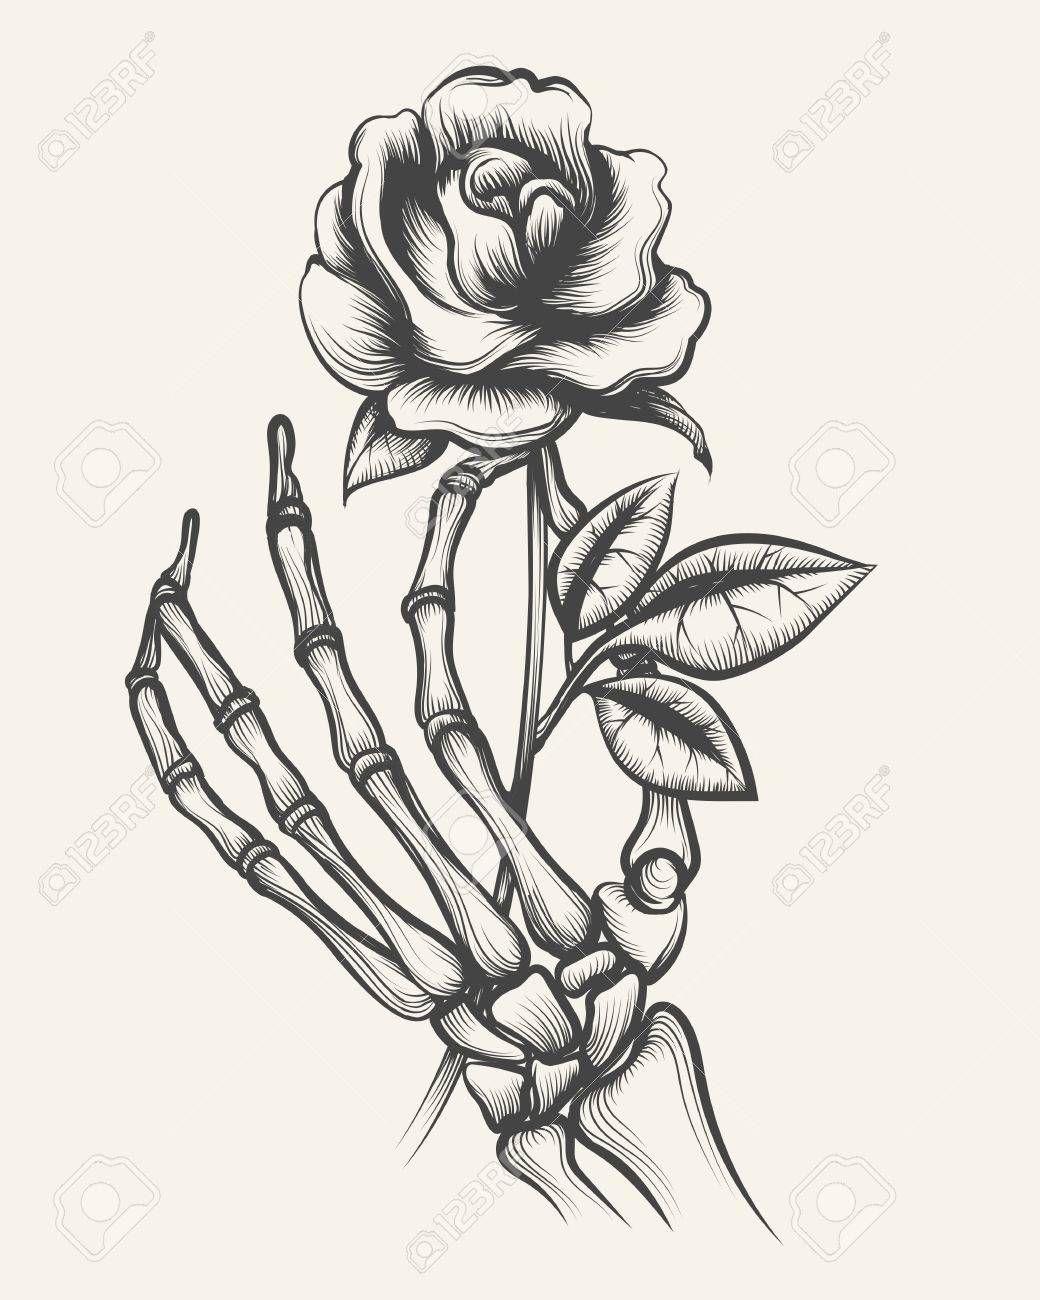 Image Result For Skeleton Hand Holding Flower